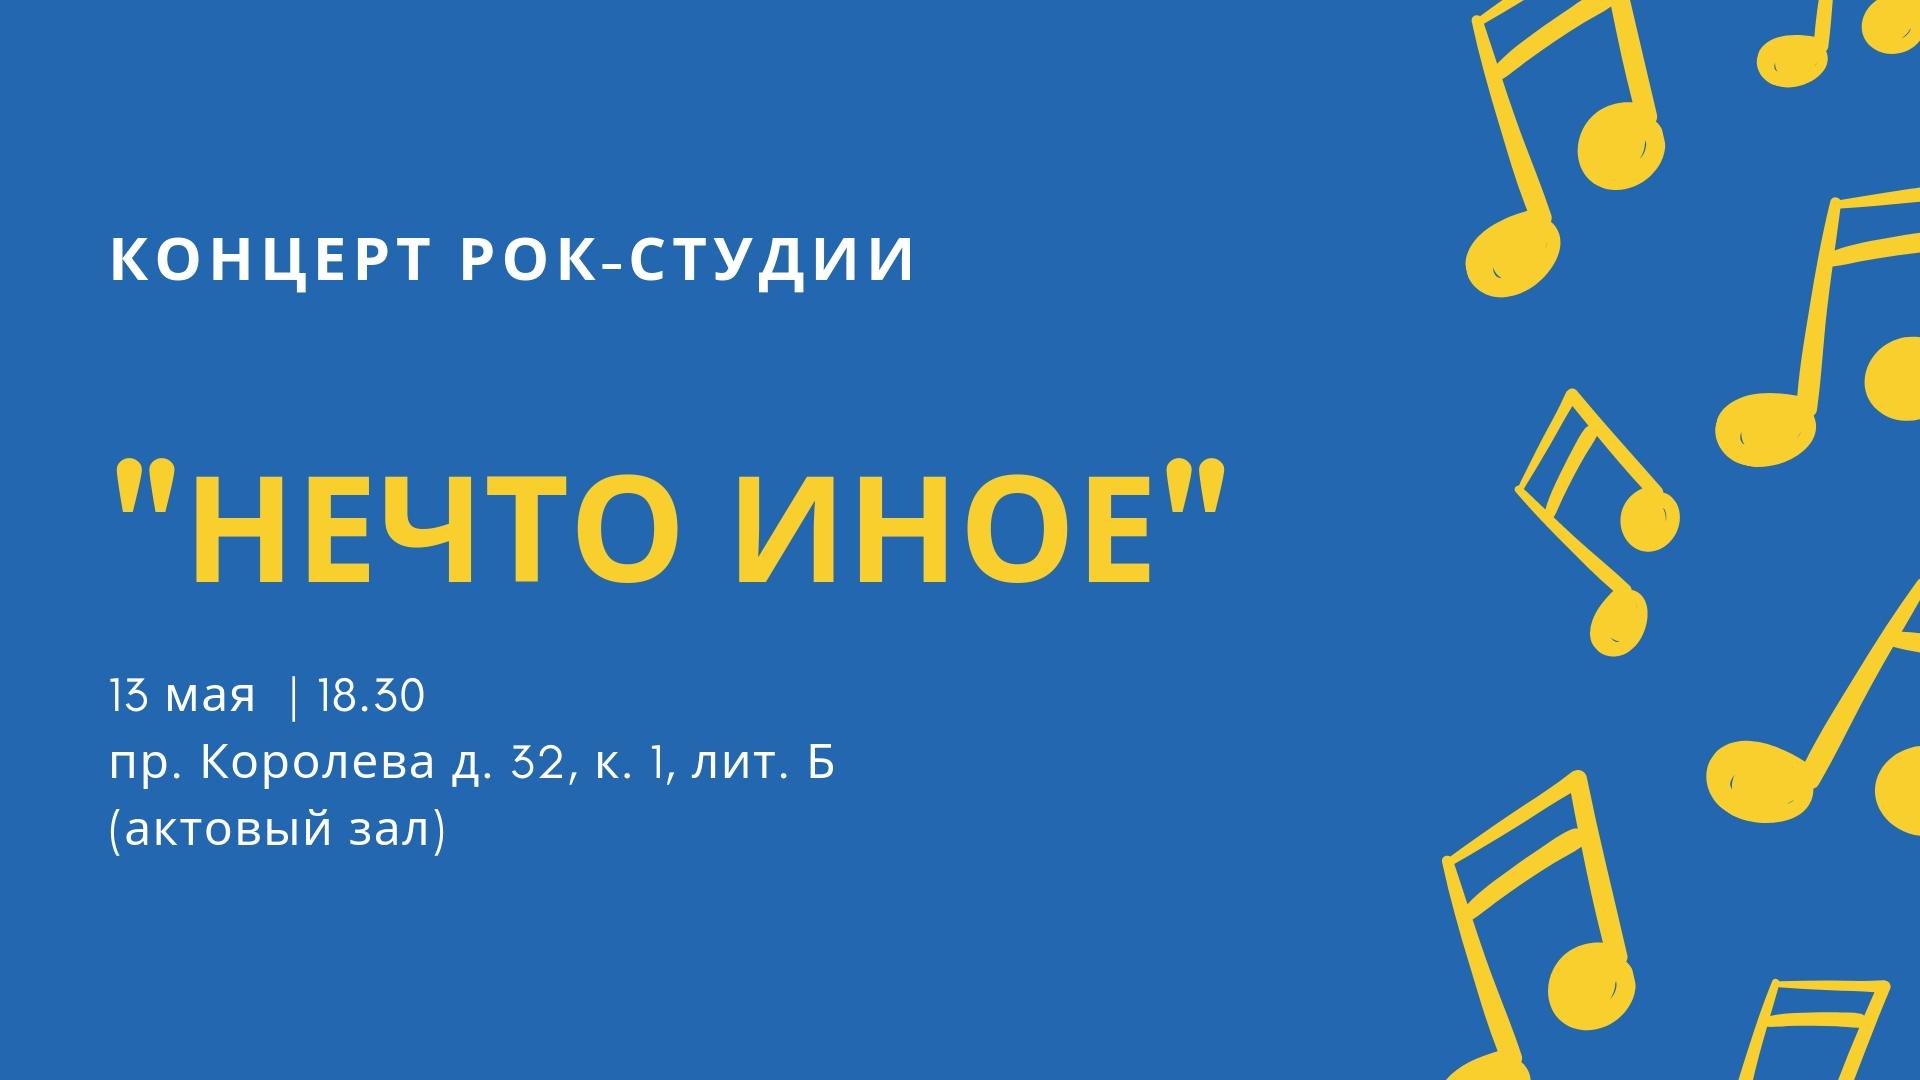 КОНЦЕРТ РОК-СТУДИИ